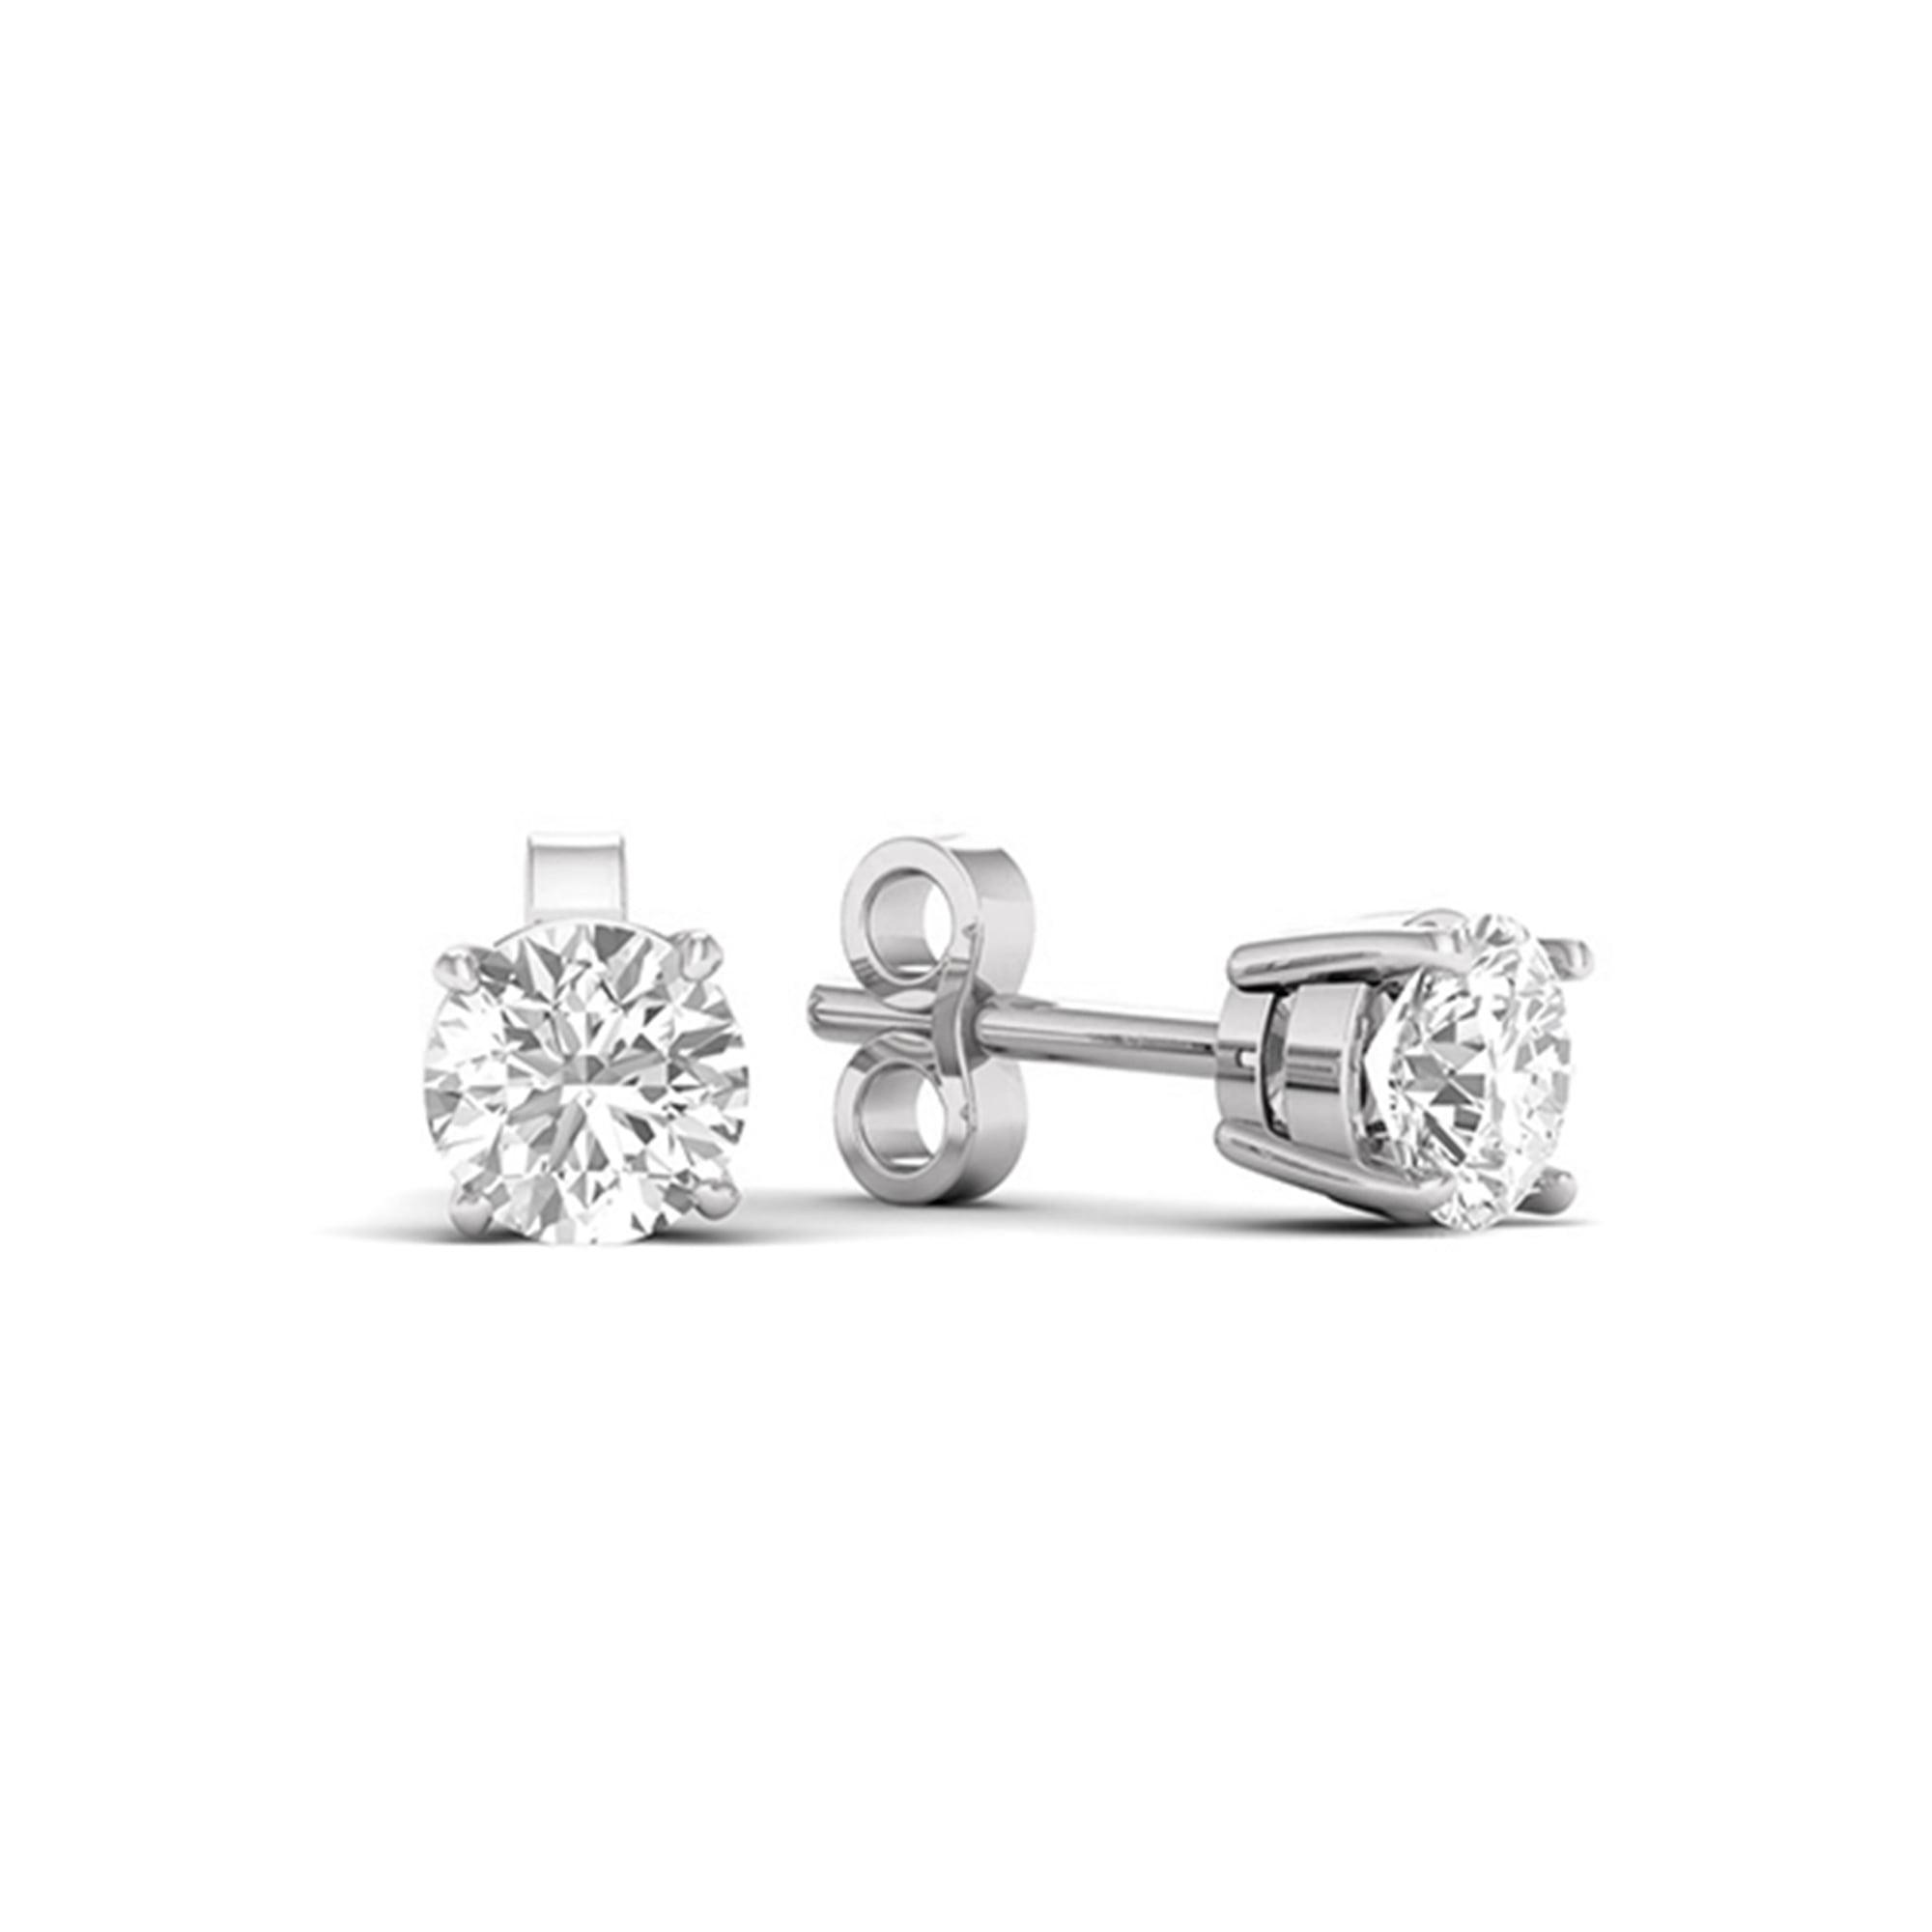 Imperial 1/6 Carat T.W. Diamond 10kt White Gold Classic Stud Earrings